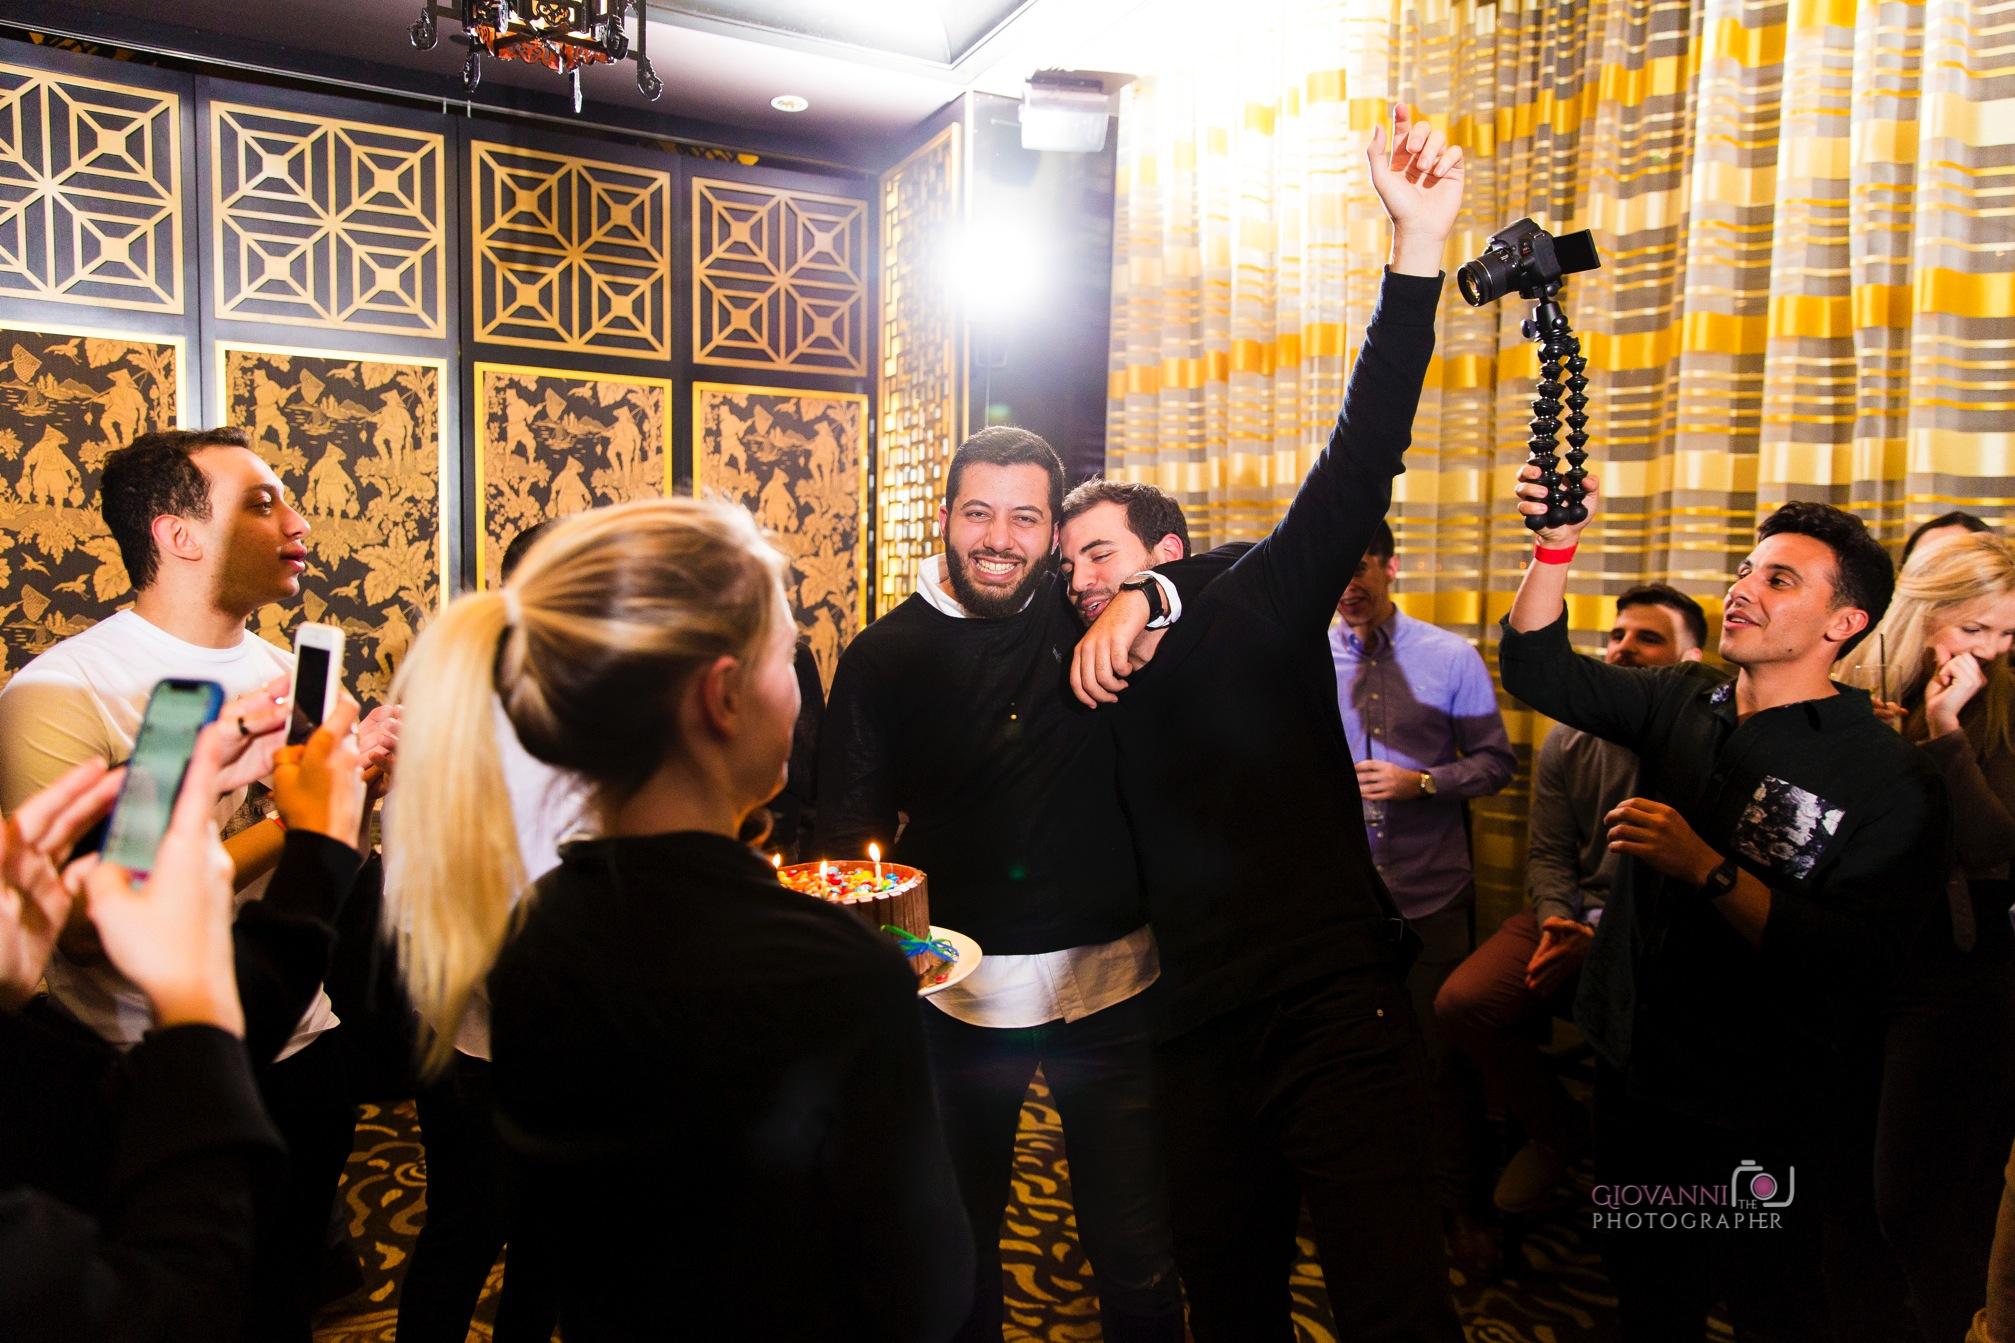 8C2A0486 Giovanni The Photographer Boston Event Photographer Mohamed's Birthday Photos 01-19-18 WM 35 Empire Restaurant.jpg